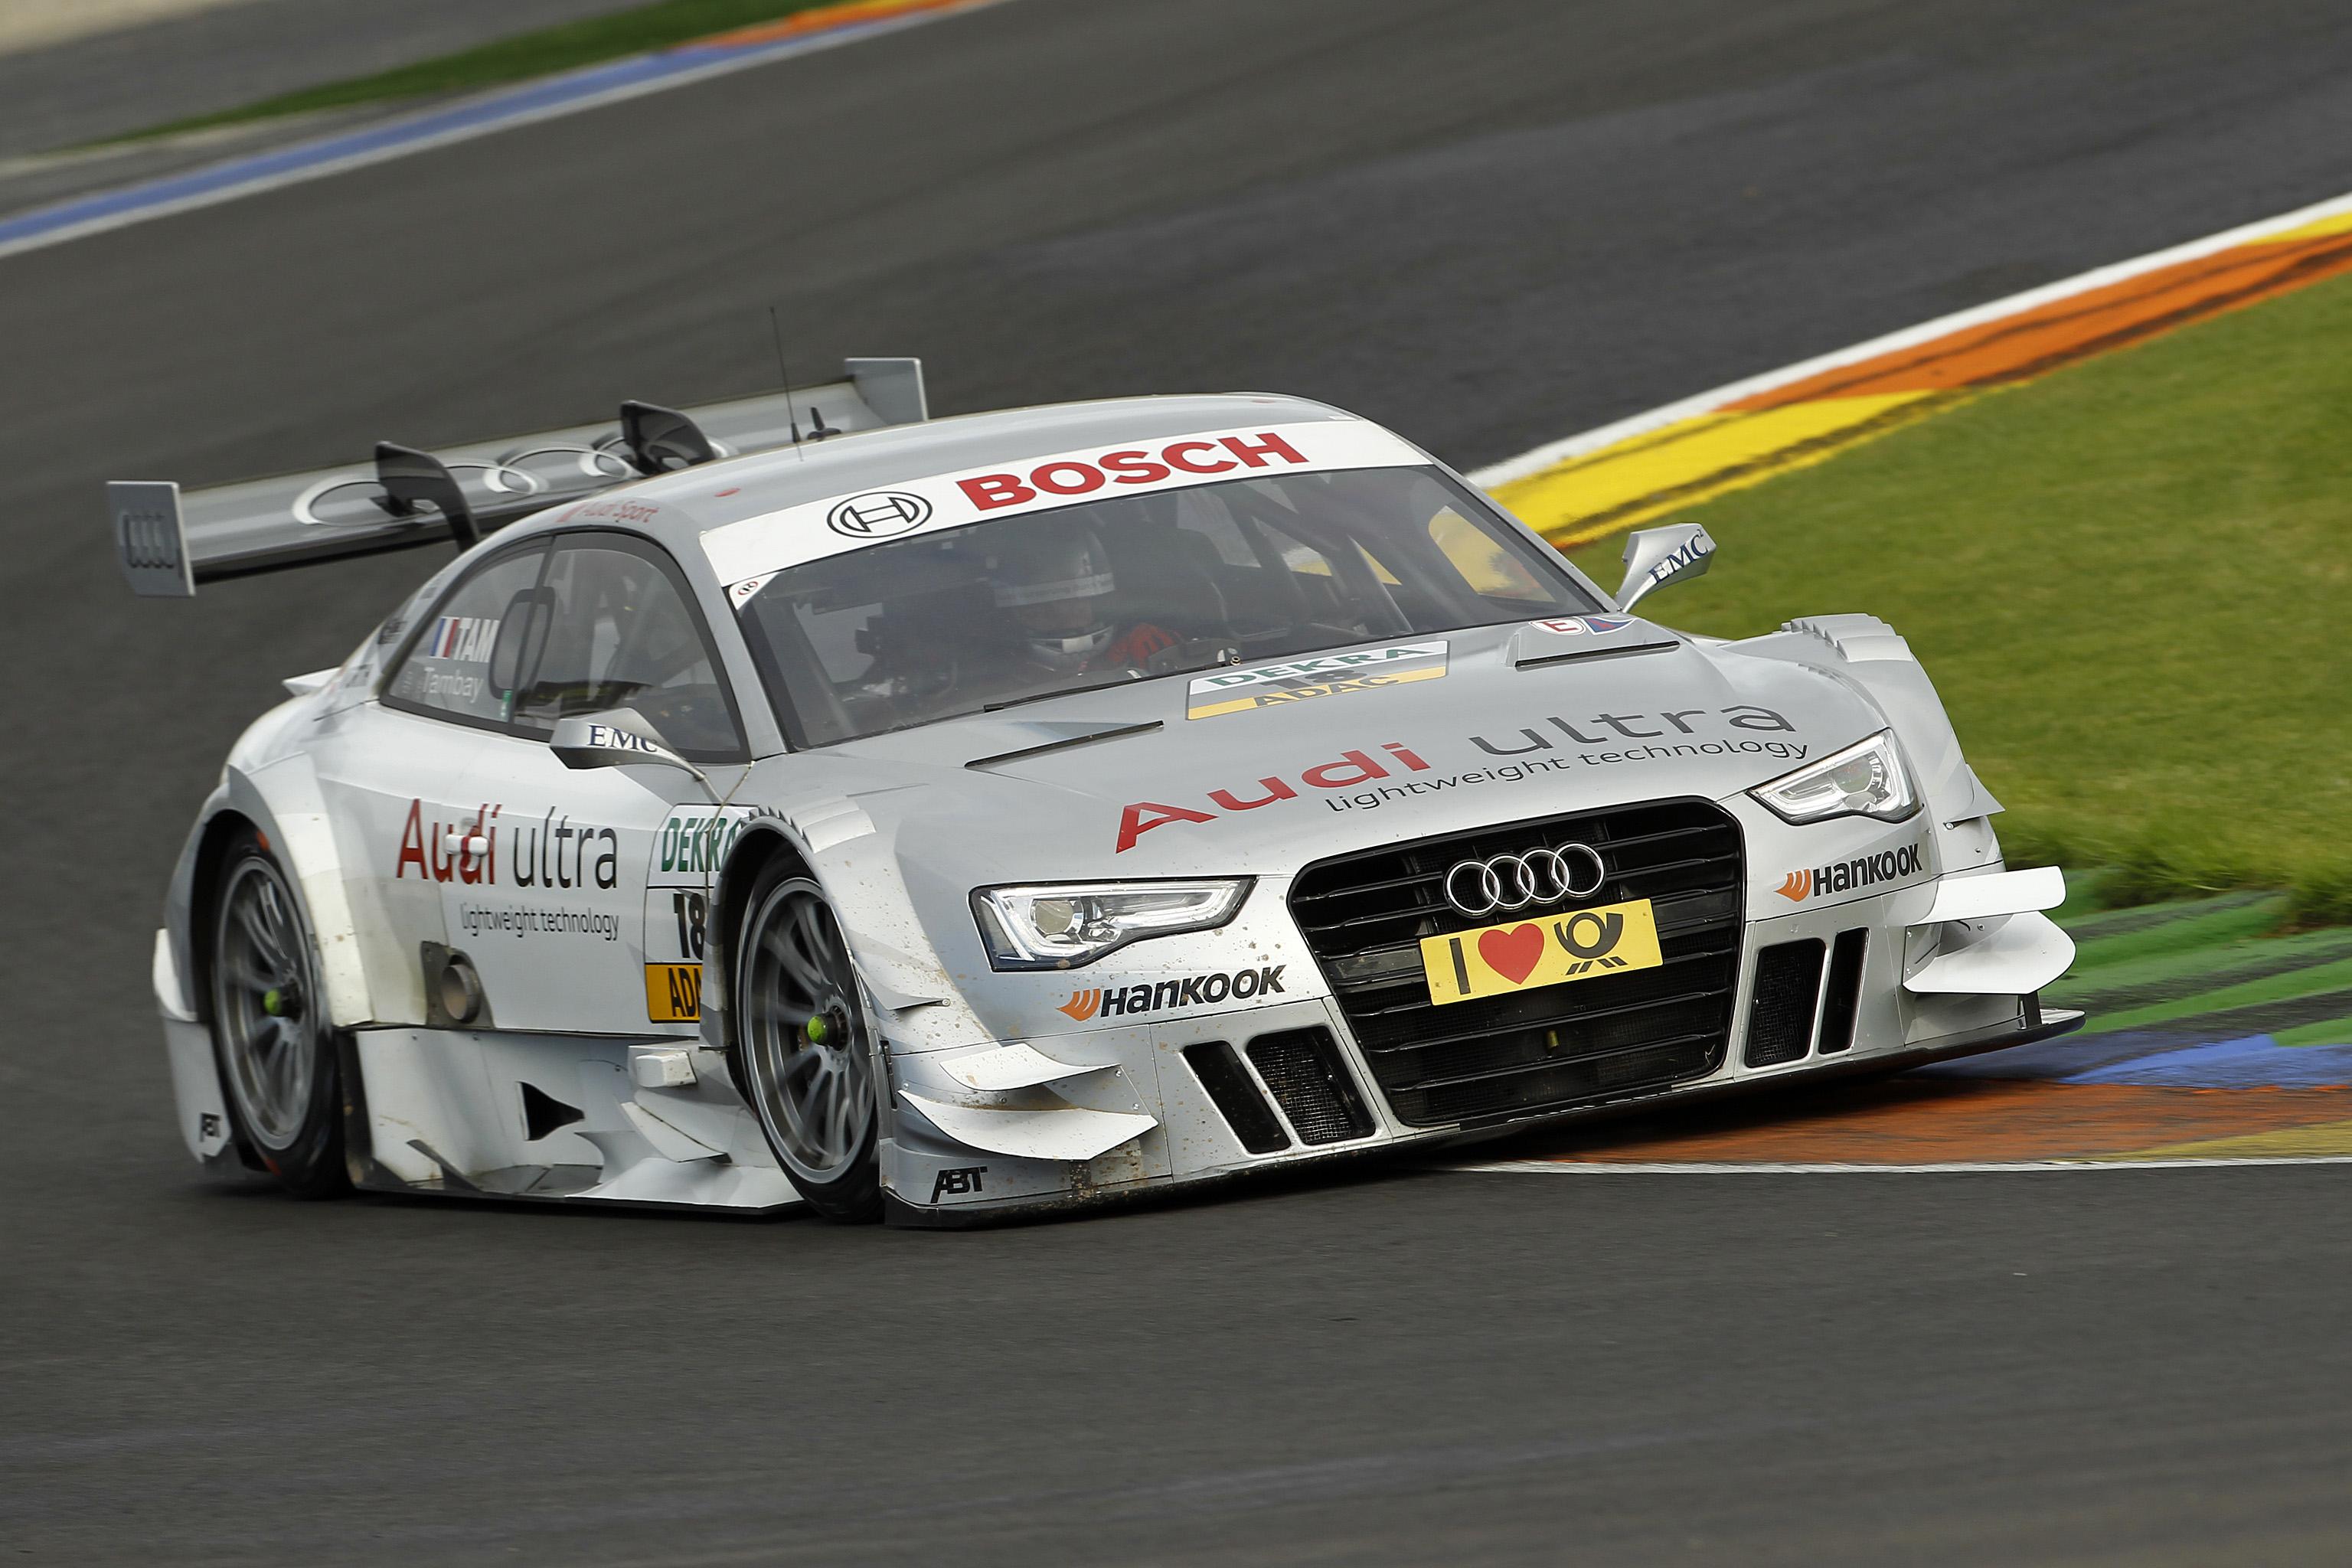 #18, Adrien Tambay (Audi Sport Team Abt, Audi ultra A5 DTM (2012))